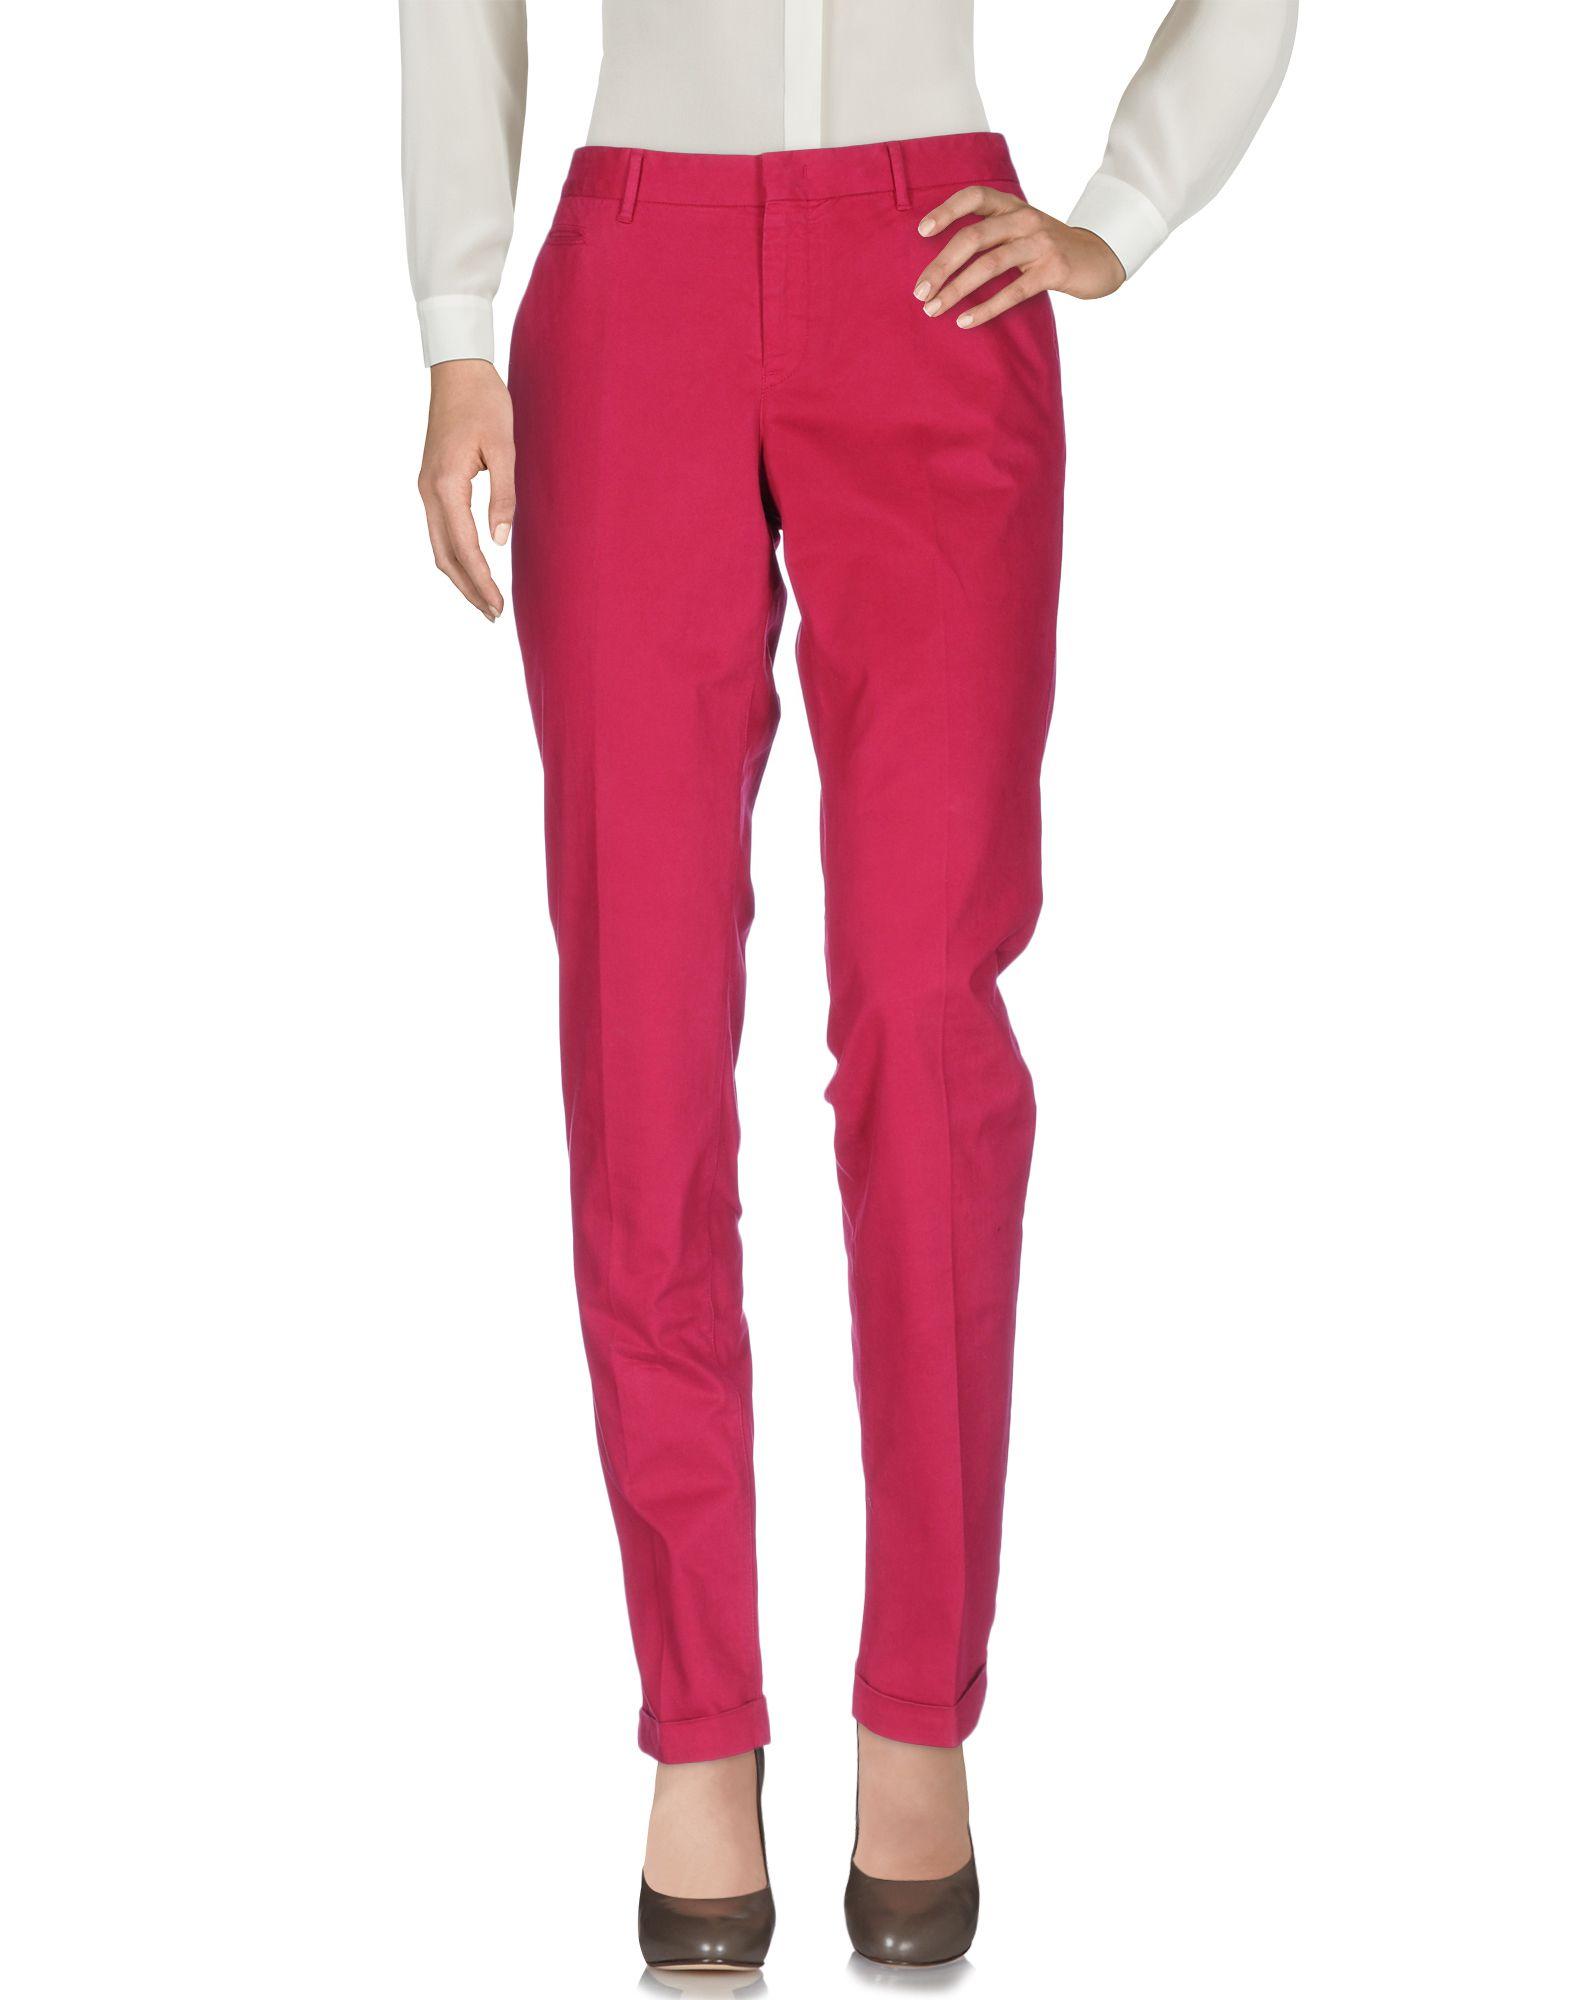 PT0W Casual Pants in Fuchsia